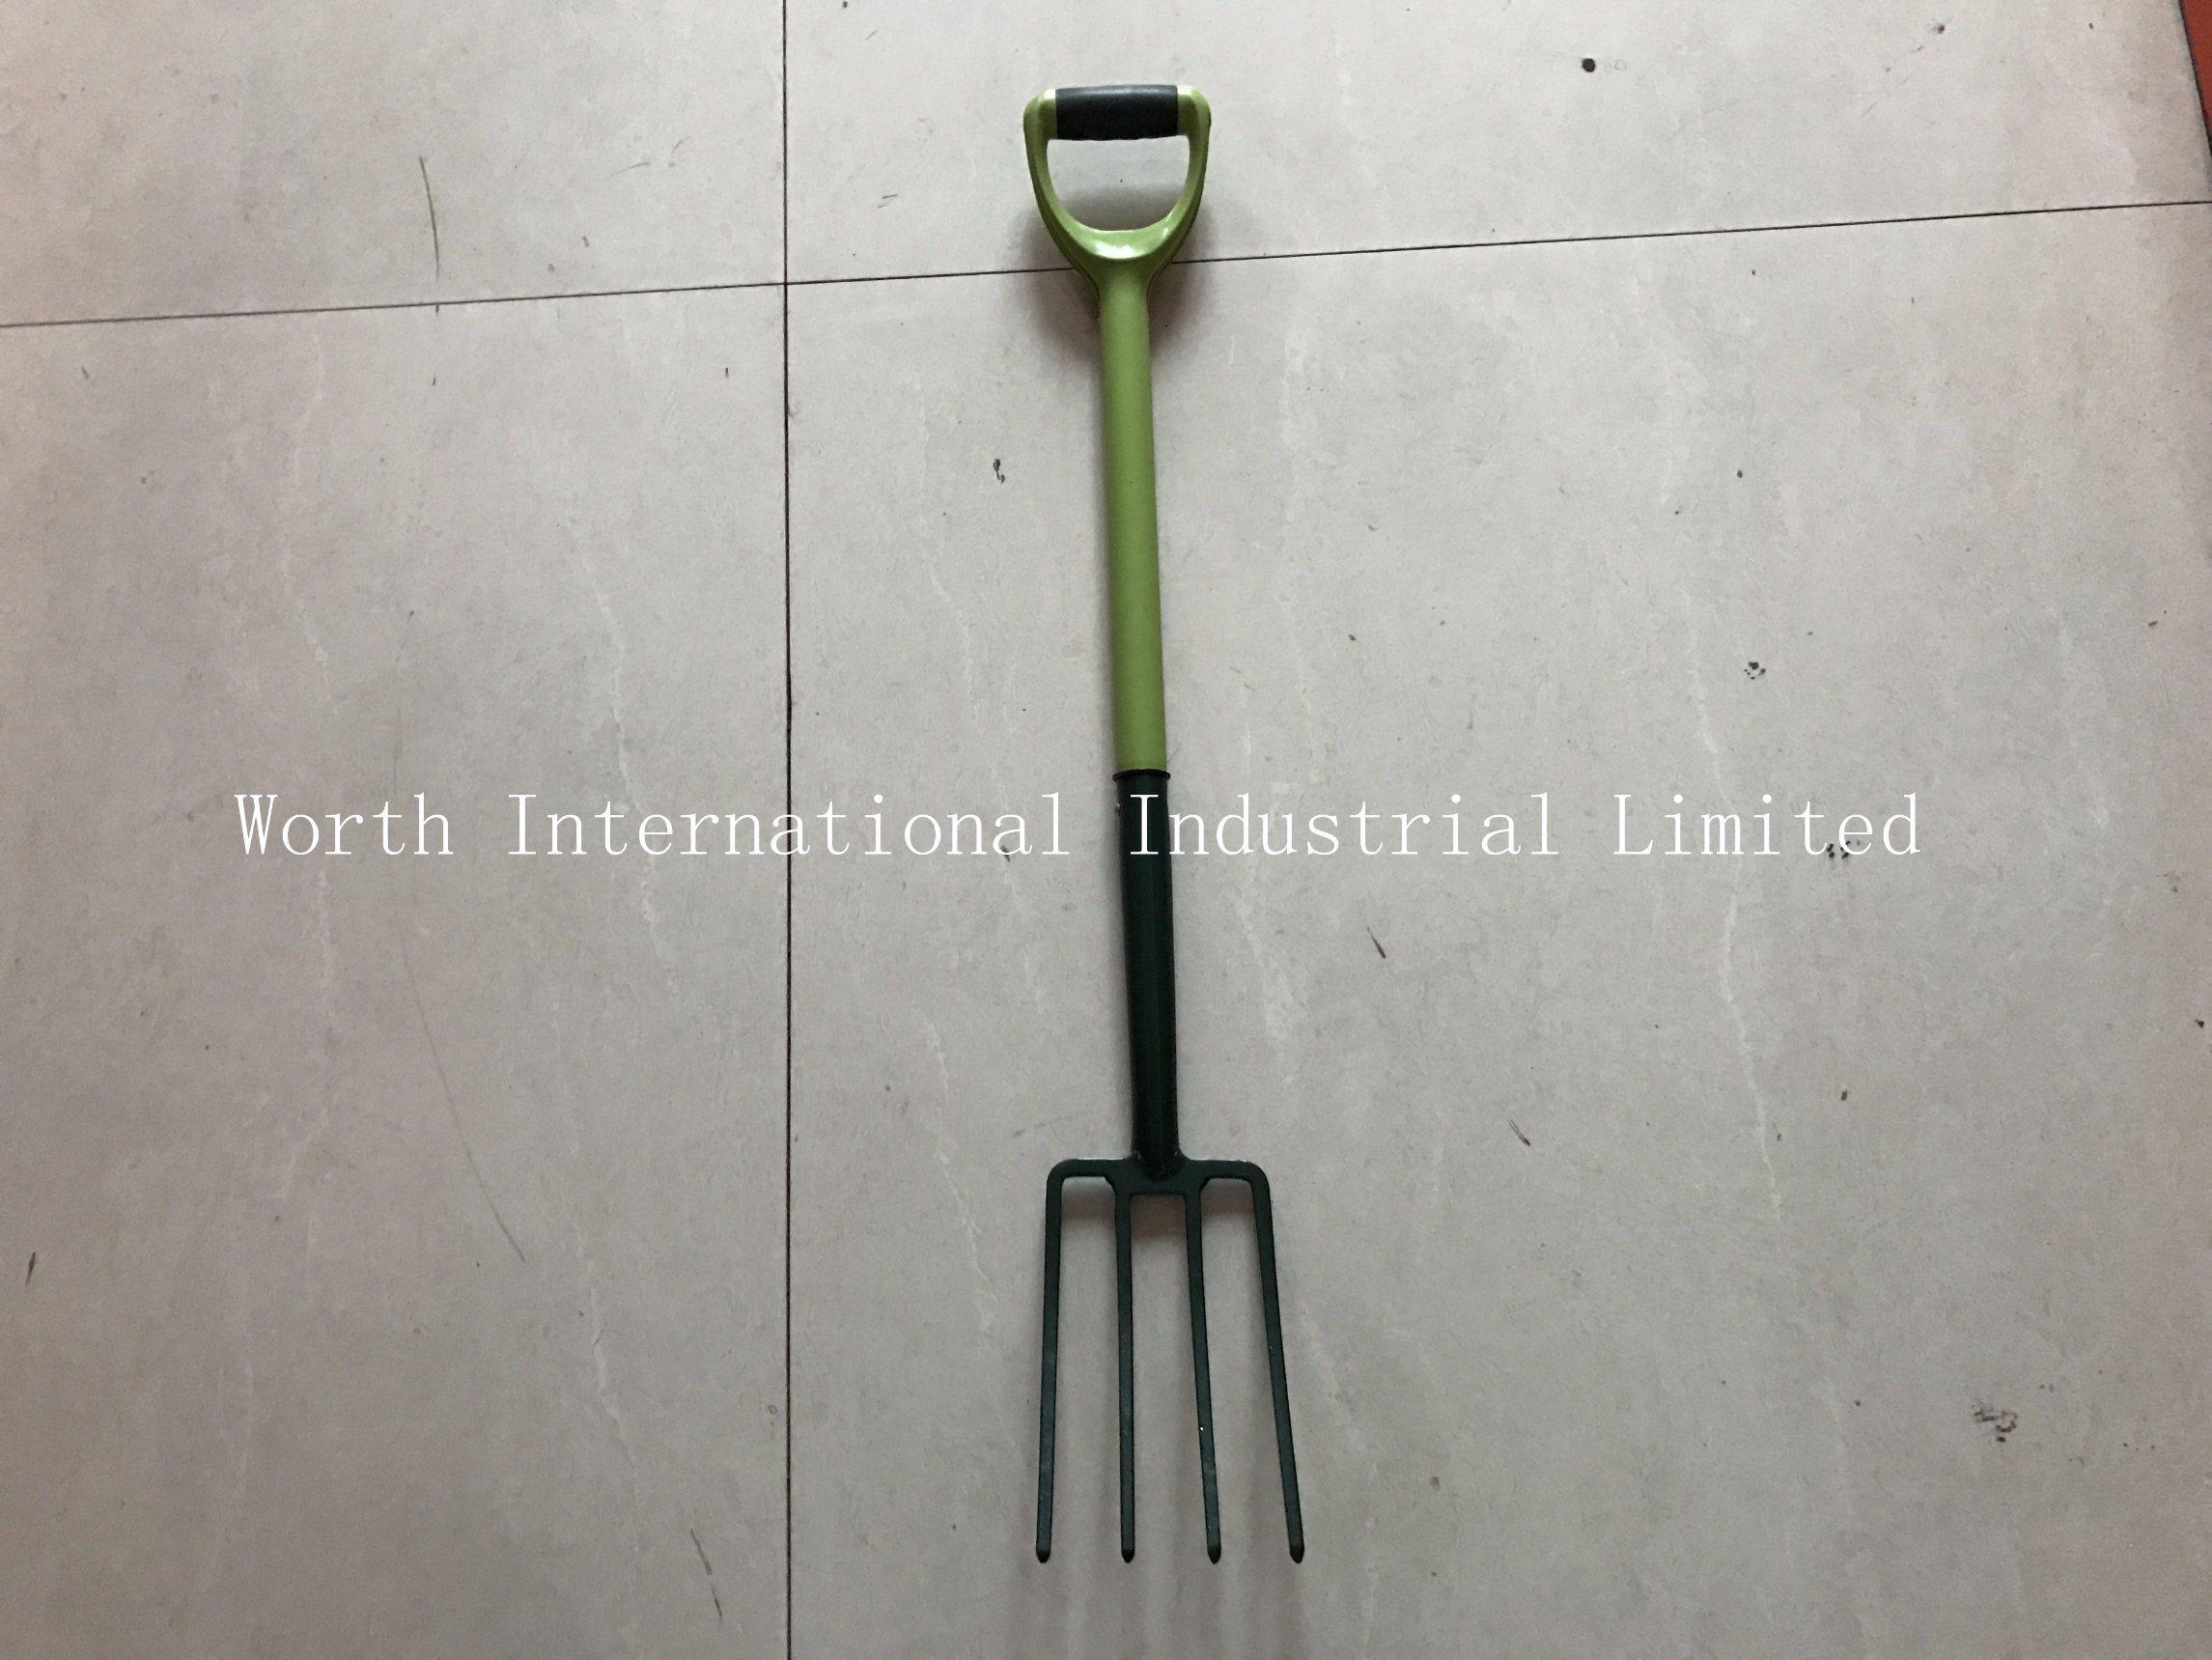 Fiberglass Handle Fork